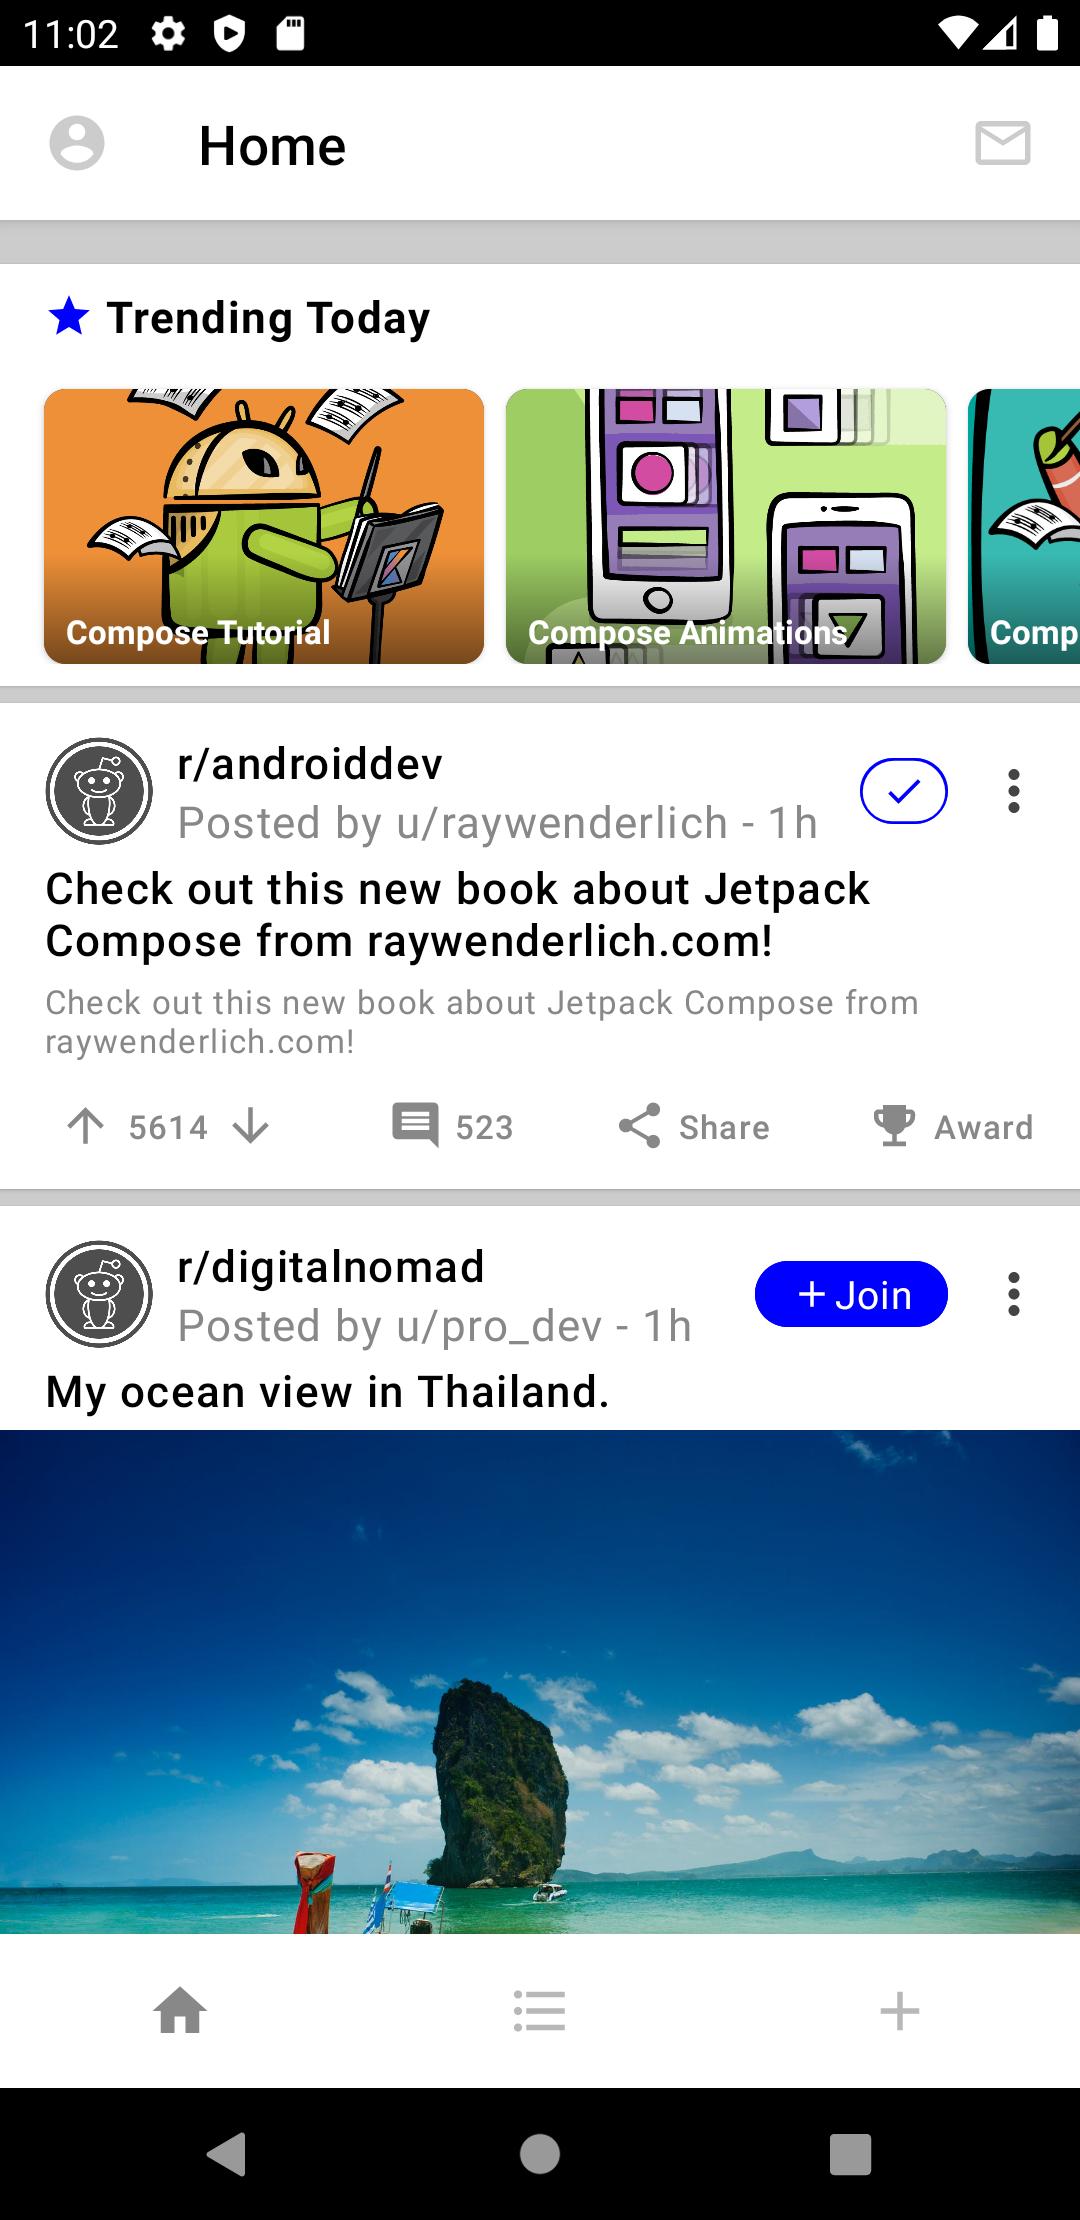 Trending topics on the Home screen